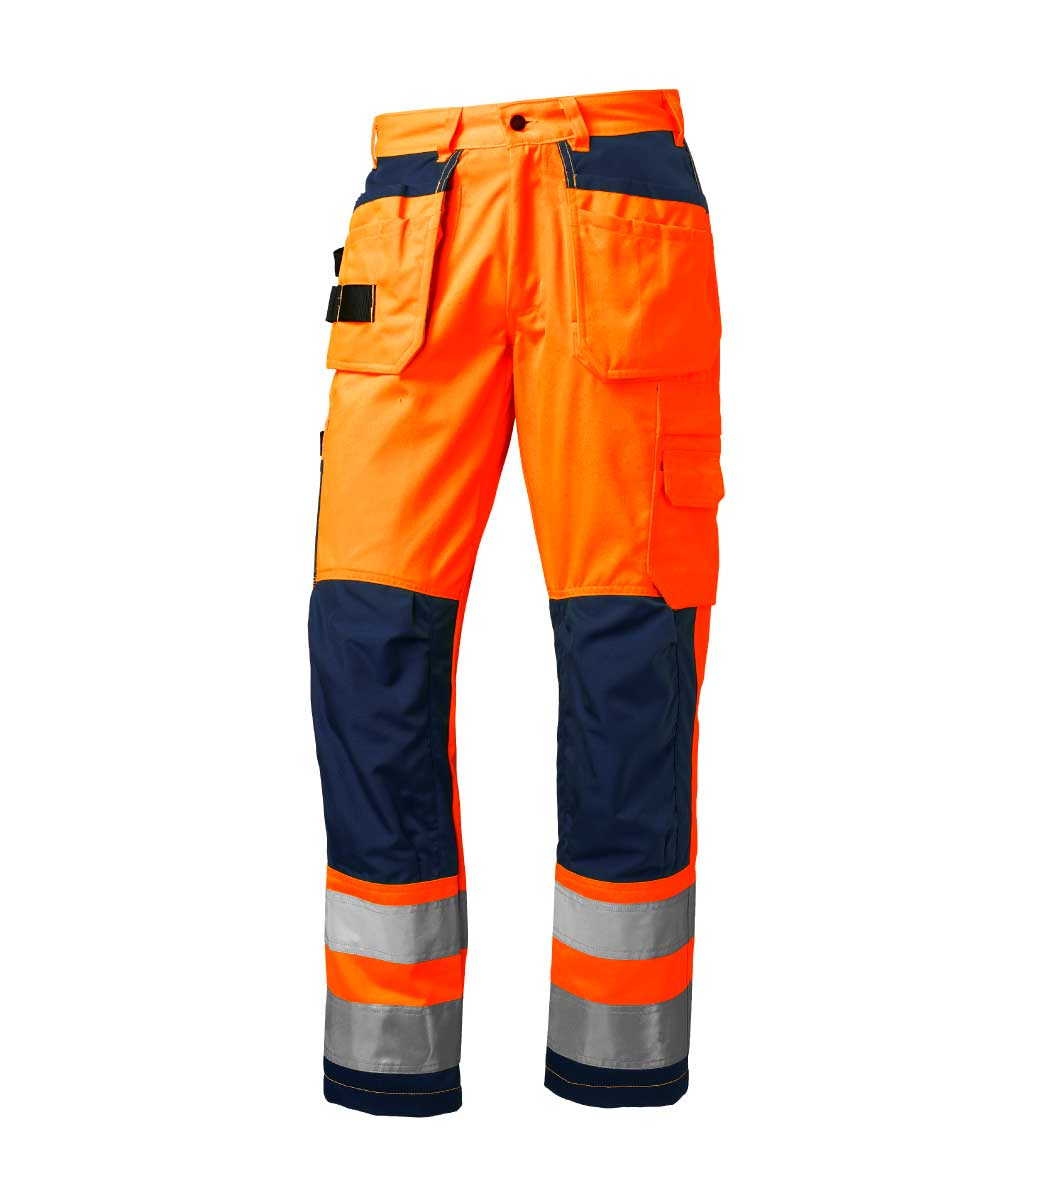 Oransje arbeidsbukse med Cordura® ~ Ezzenza.no Arbeidsklær